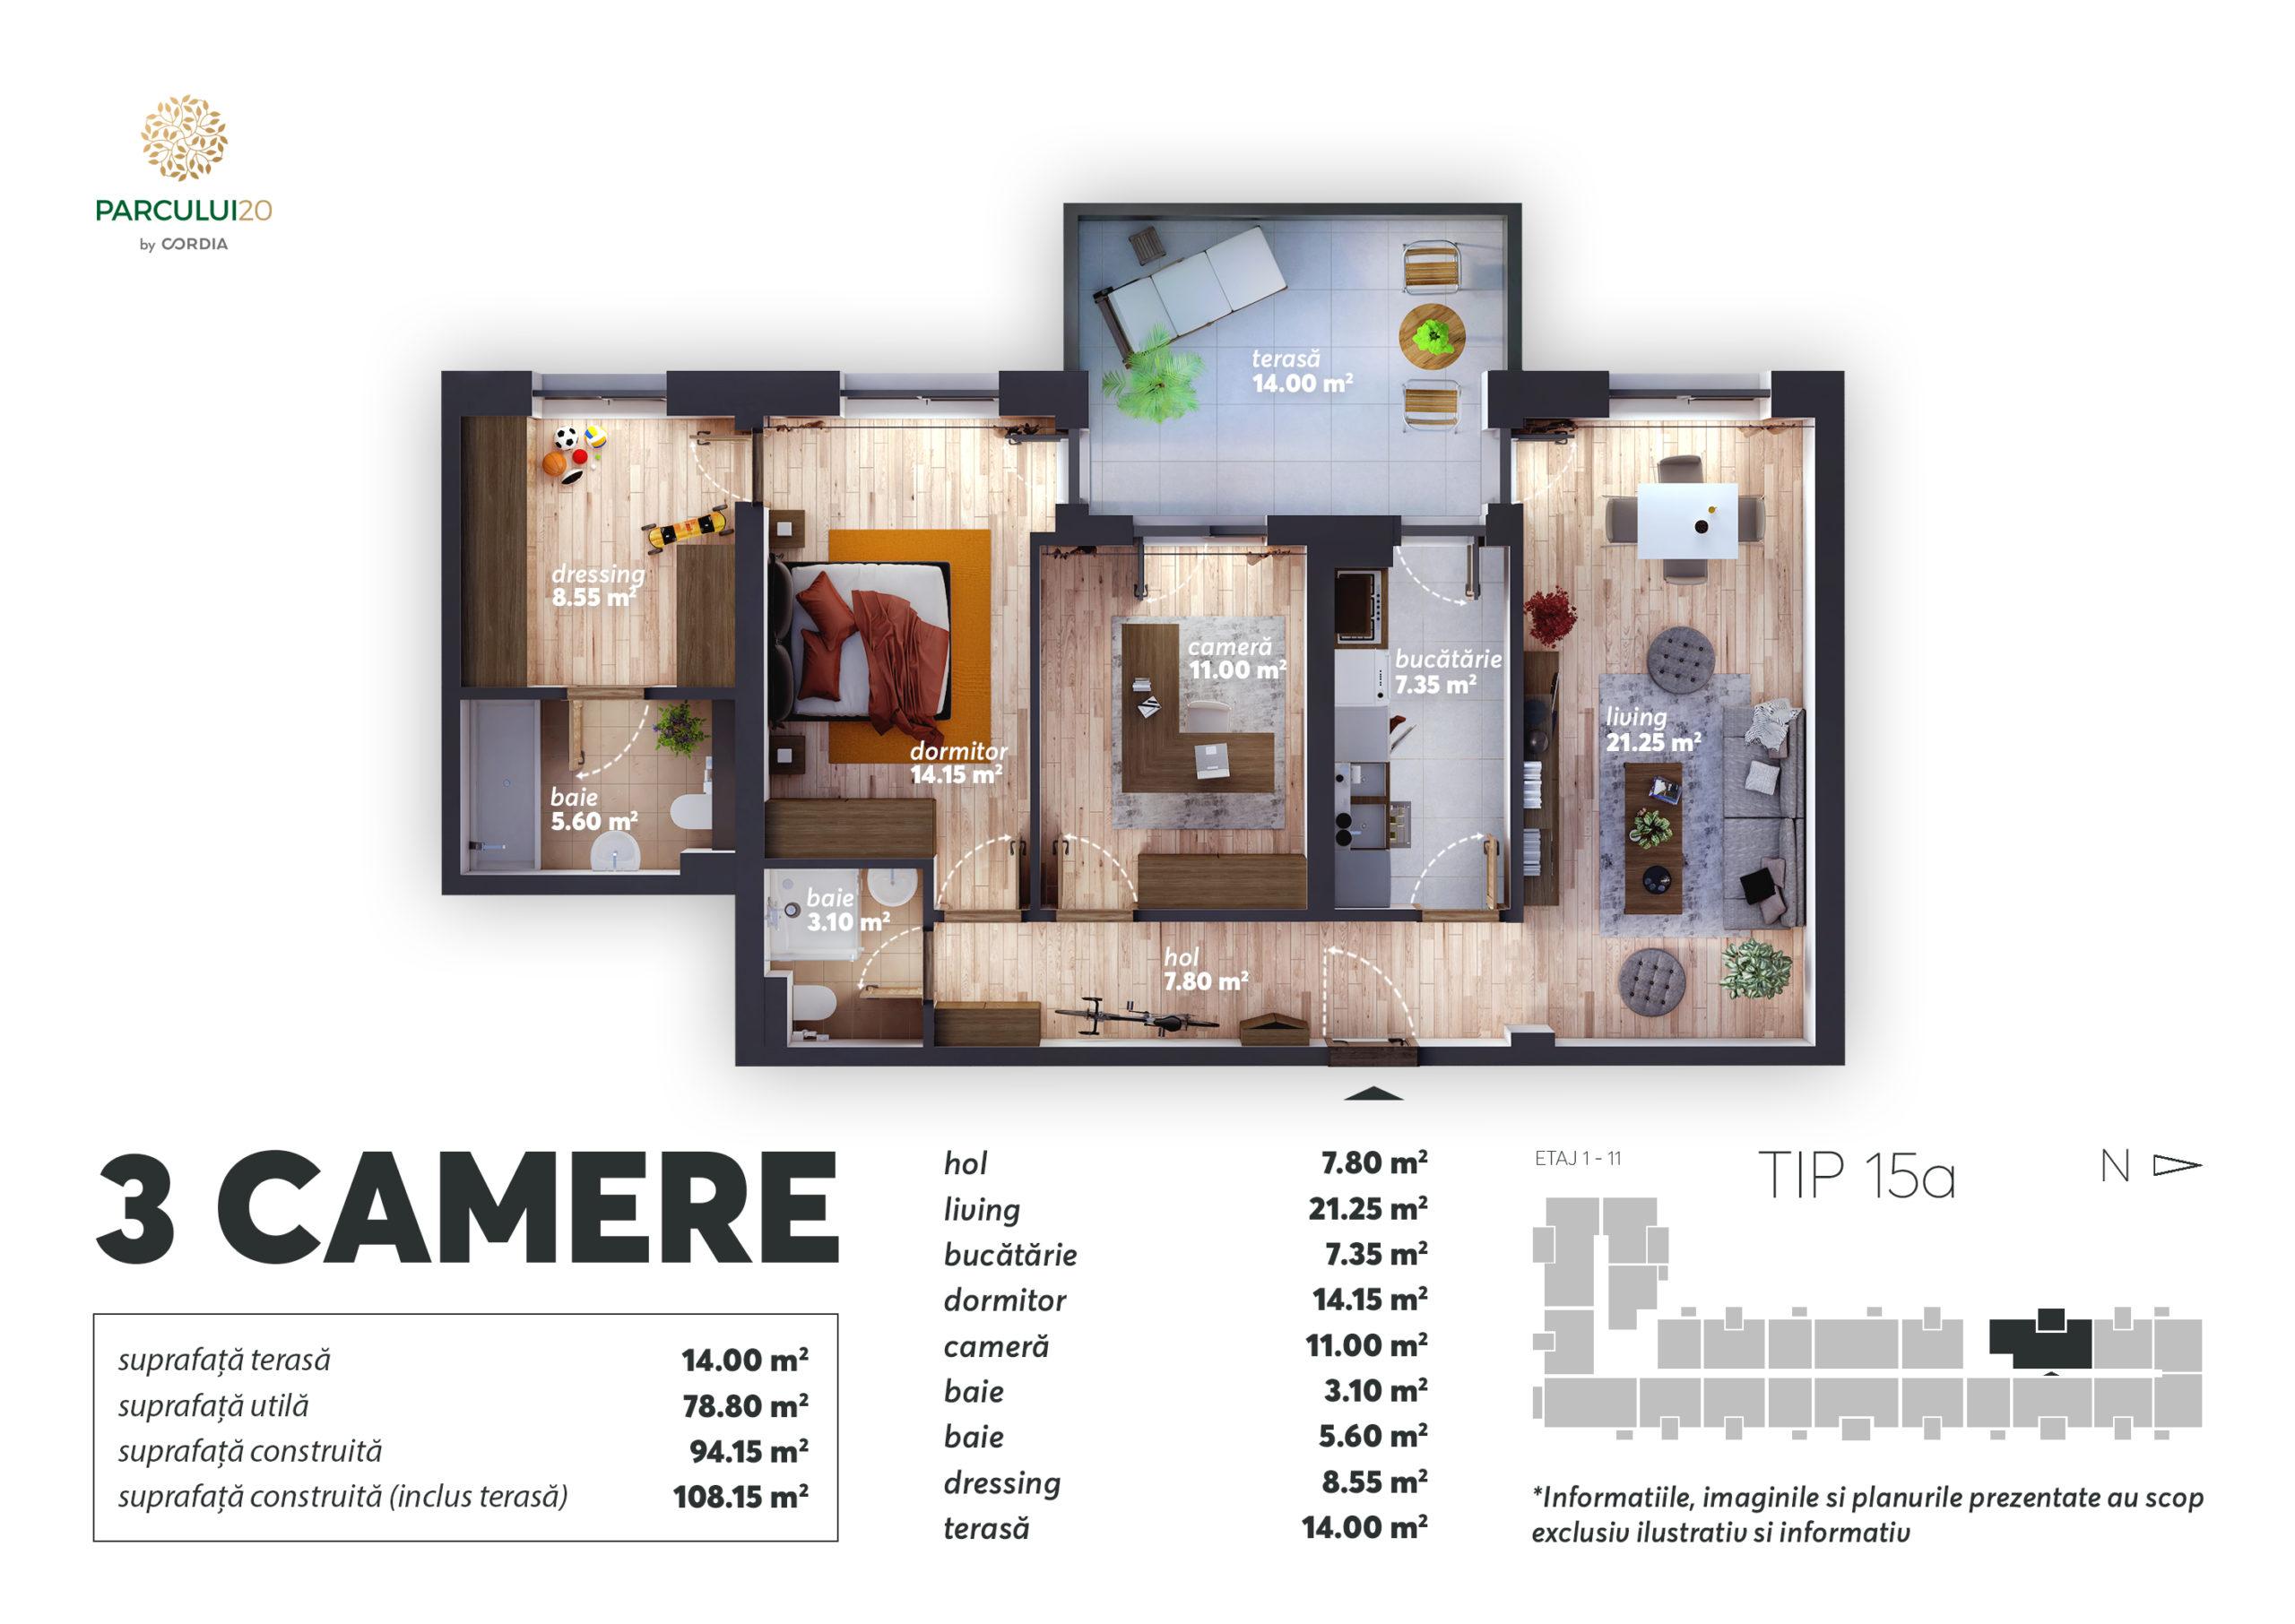 Apartament trei camere - oferta lunii iunie Parcului20